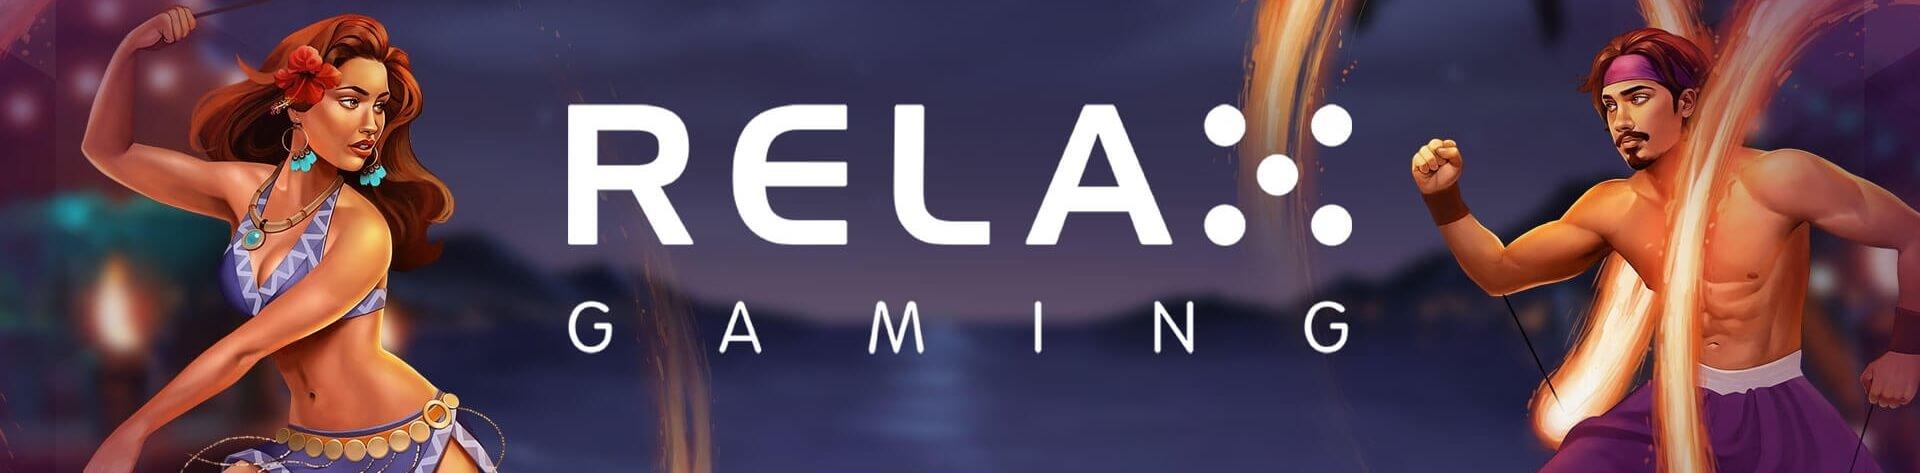 Storm Gaming Relax Gaming CS